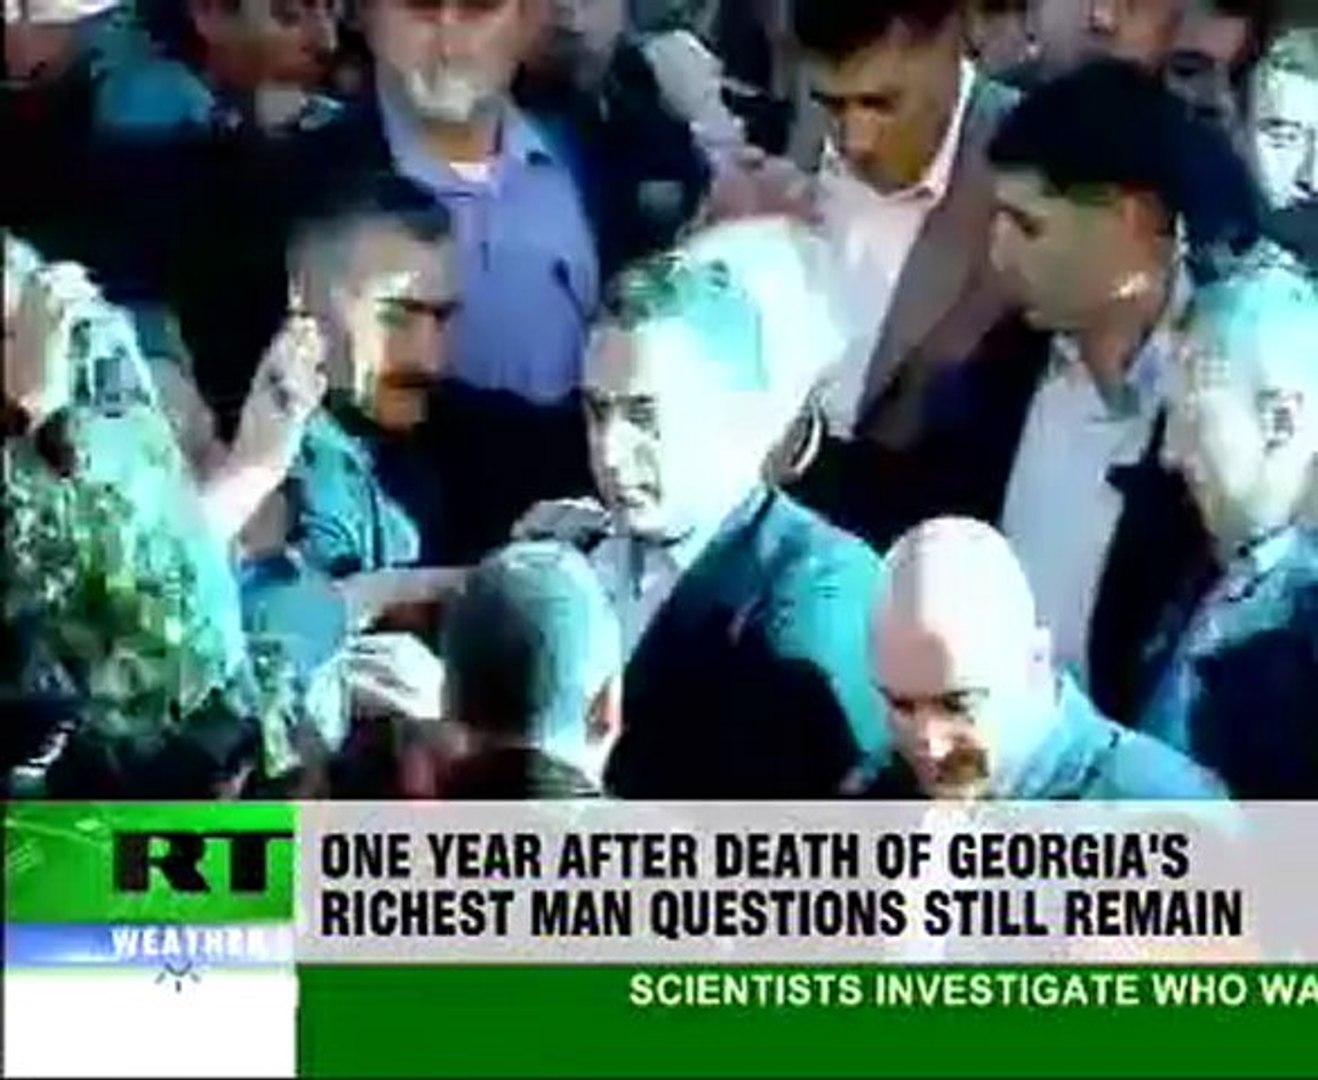 Georgia: politics, money and death